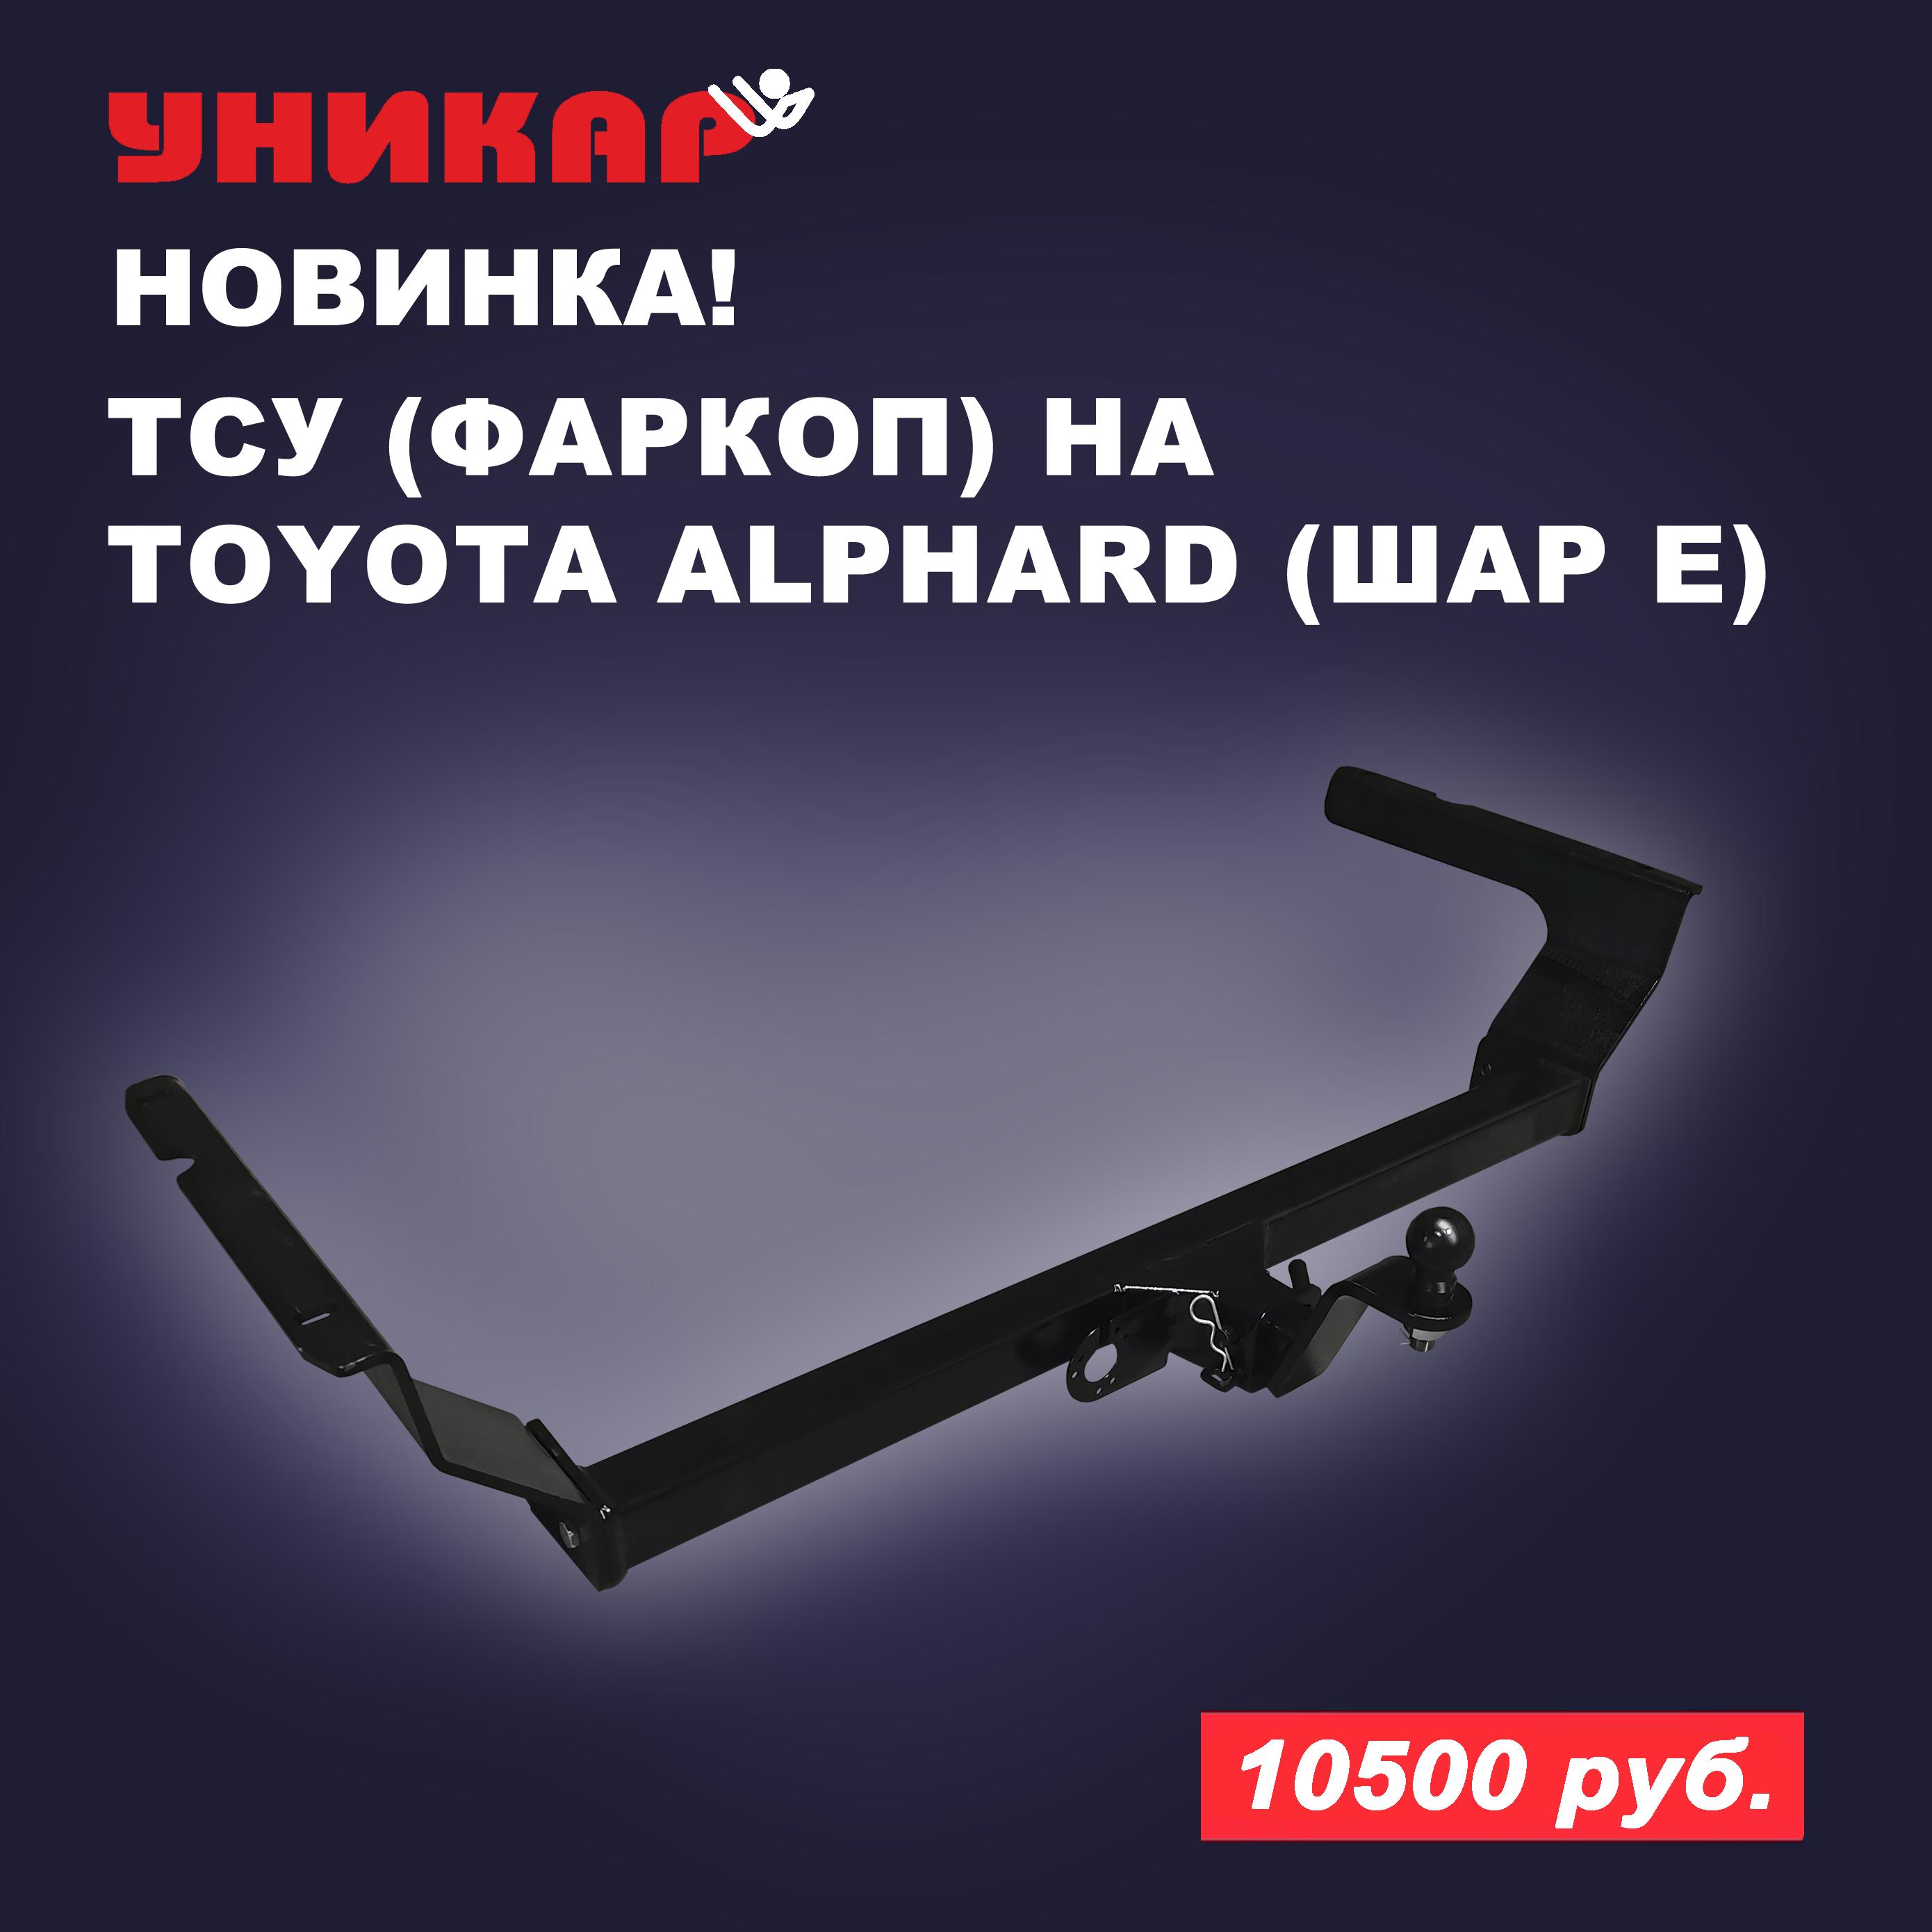 Новинка! ТСУ Toyota Alphard (шар Е)